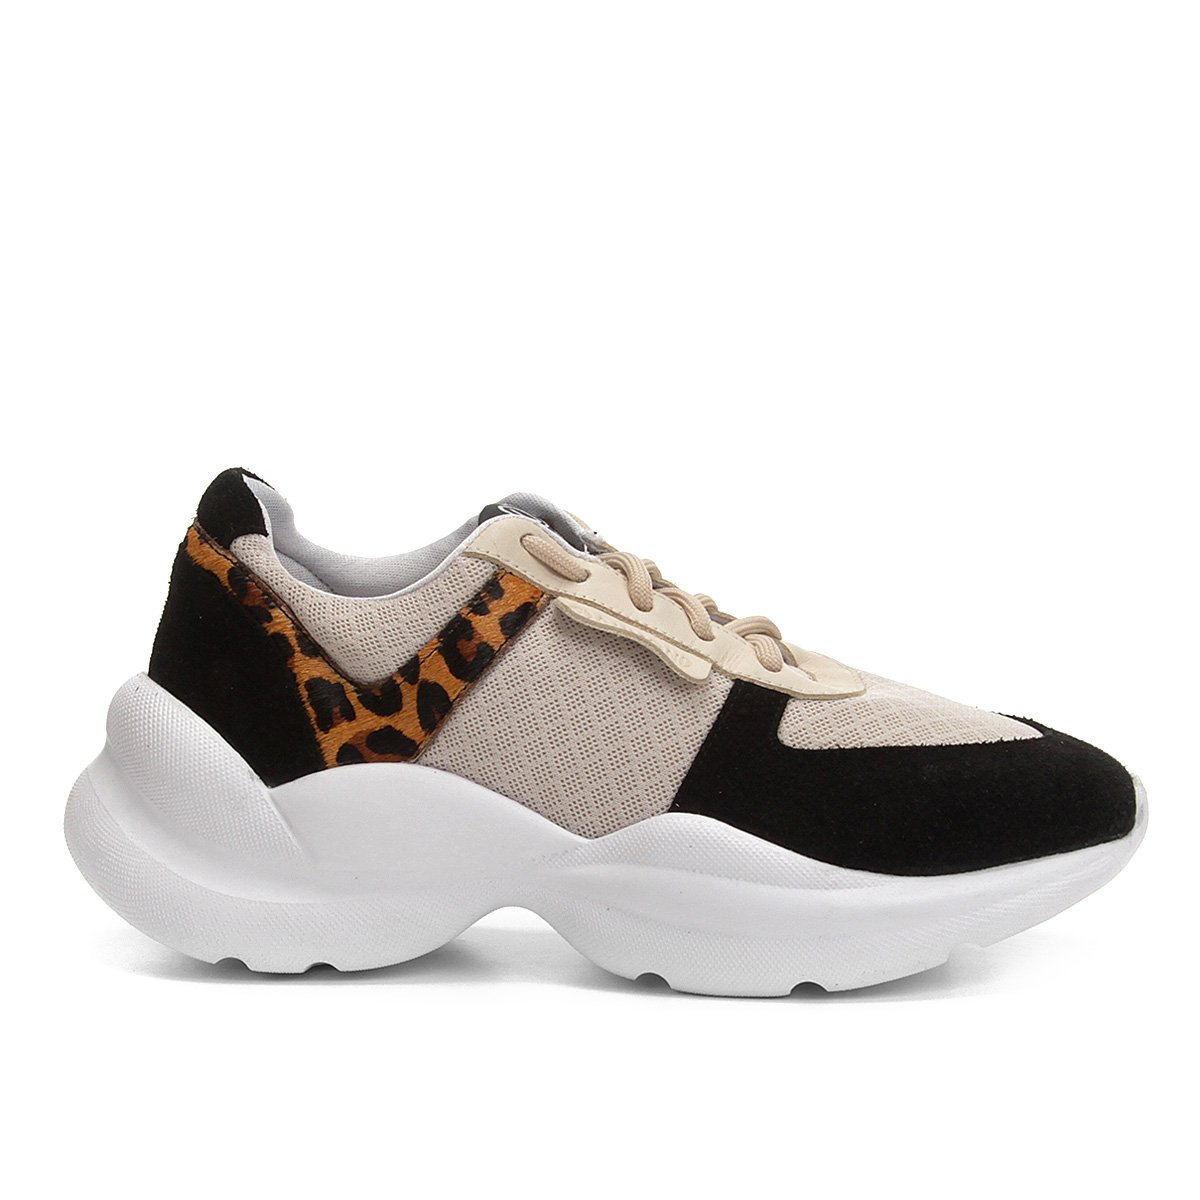 Oncinha Tênis Tênis Preto Chunky Sneaker Dumond Feminino Dumond Detalhe xPwYawS